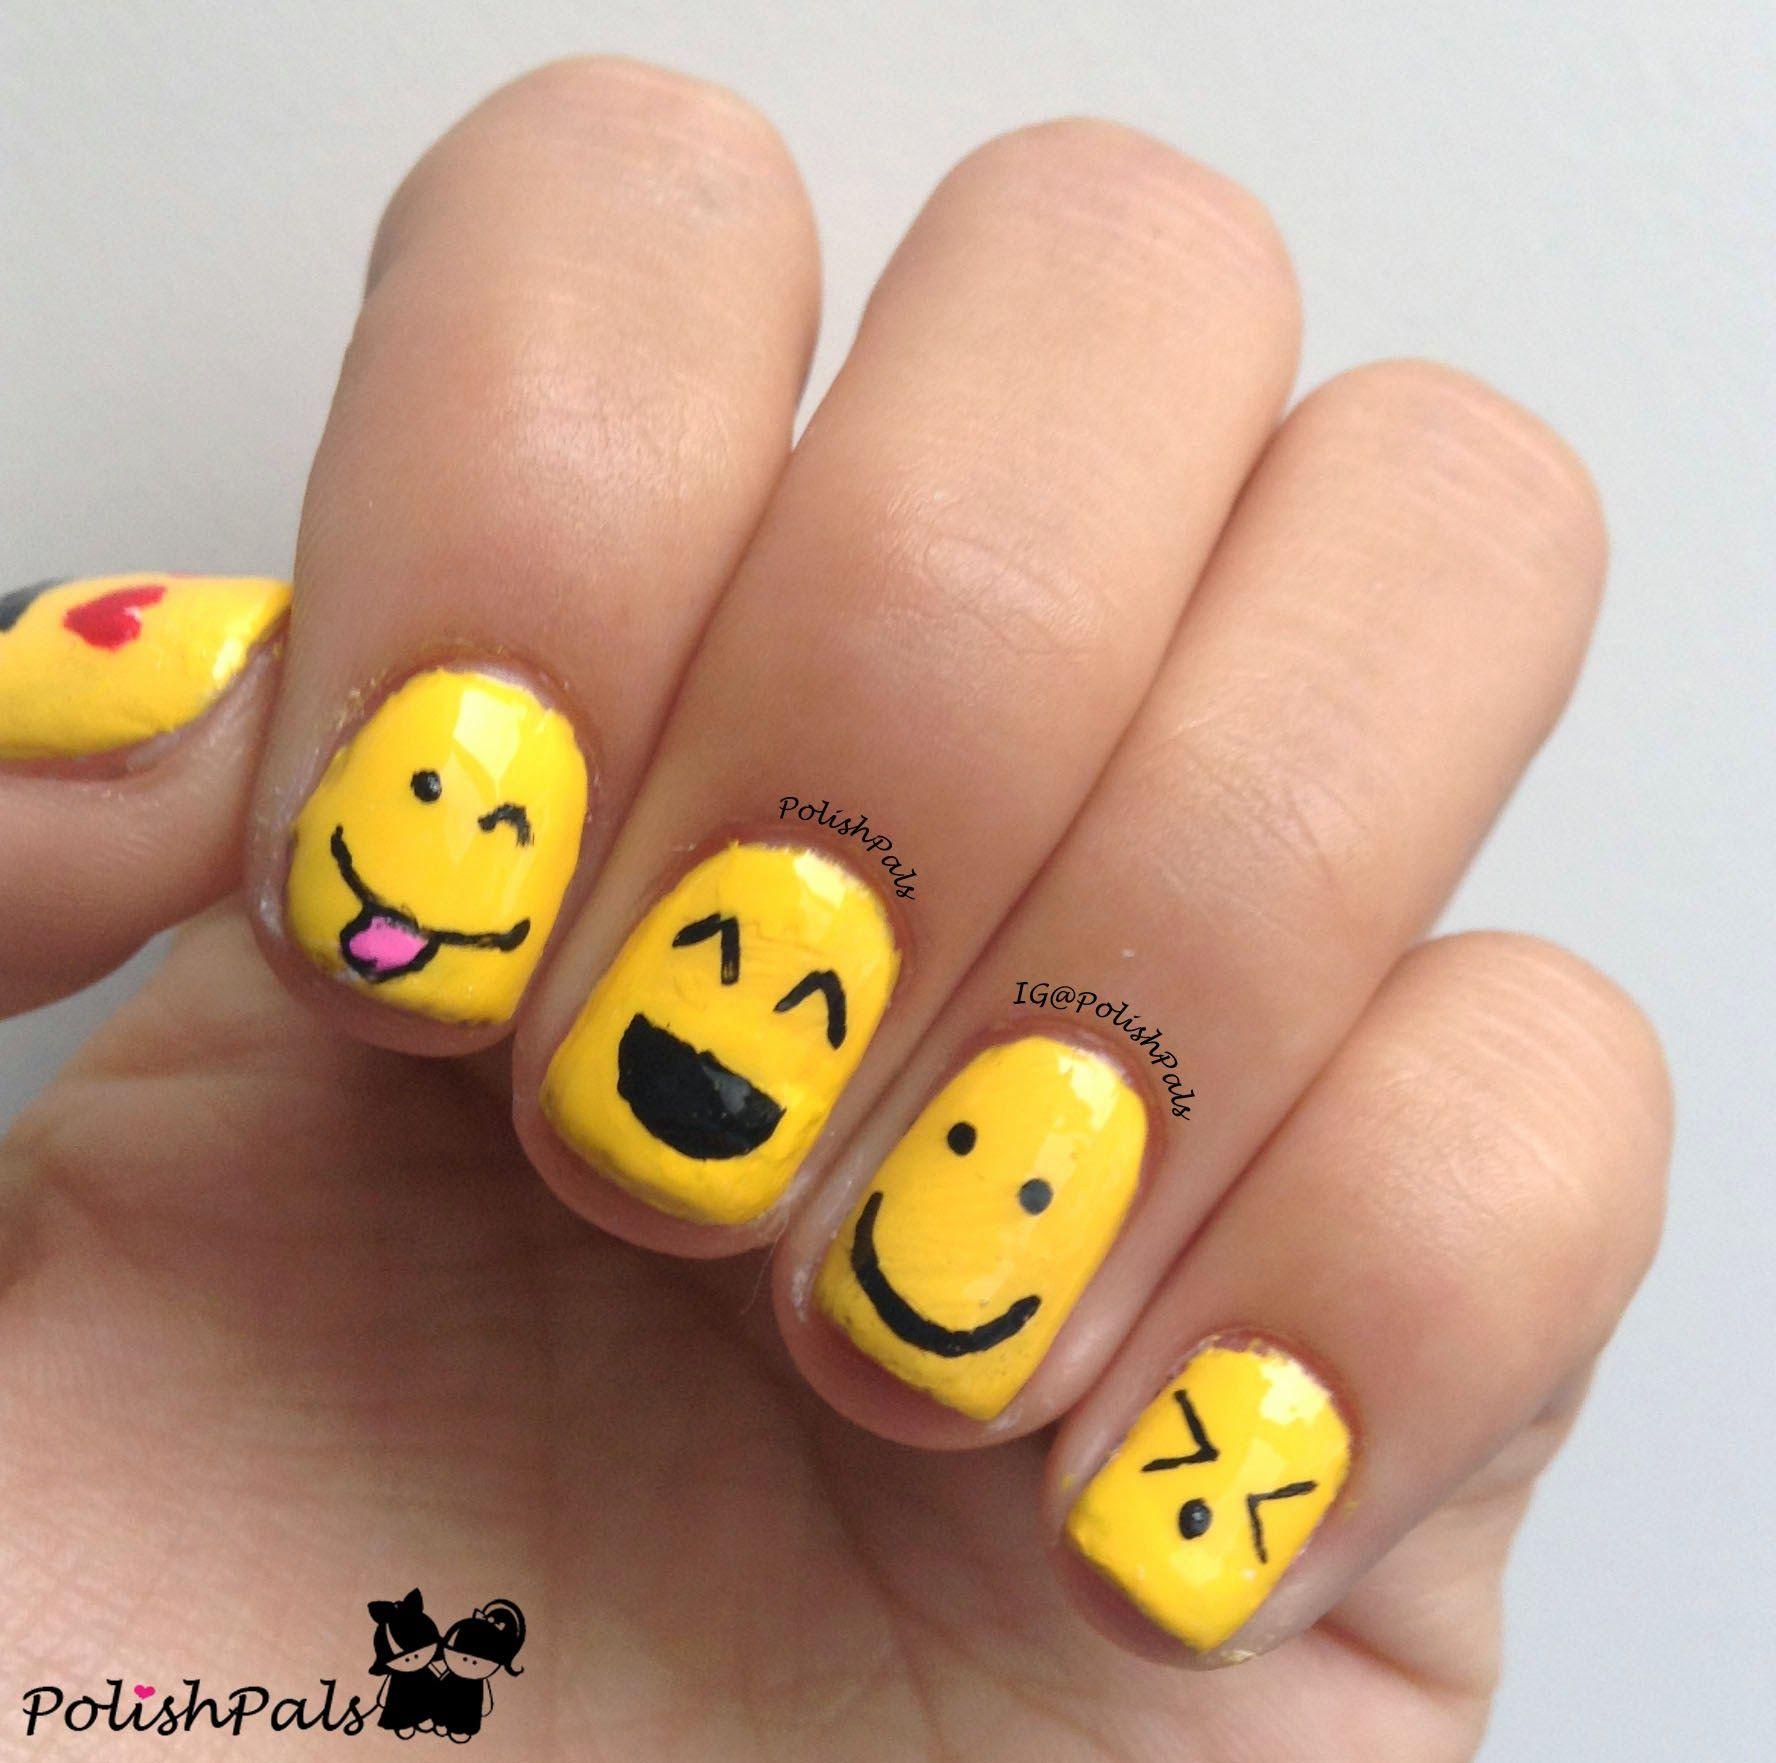 Smiley Face Nail Designs Nail Designs Smiley Face Kids Nail Designs Smiley